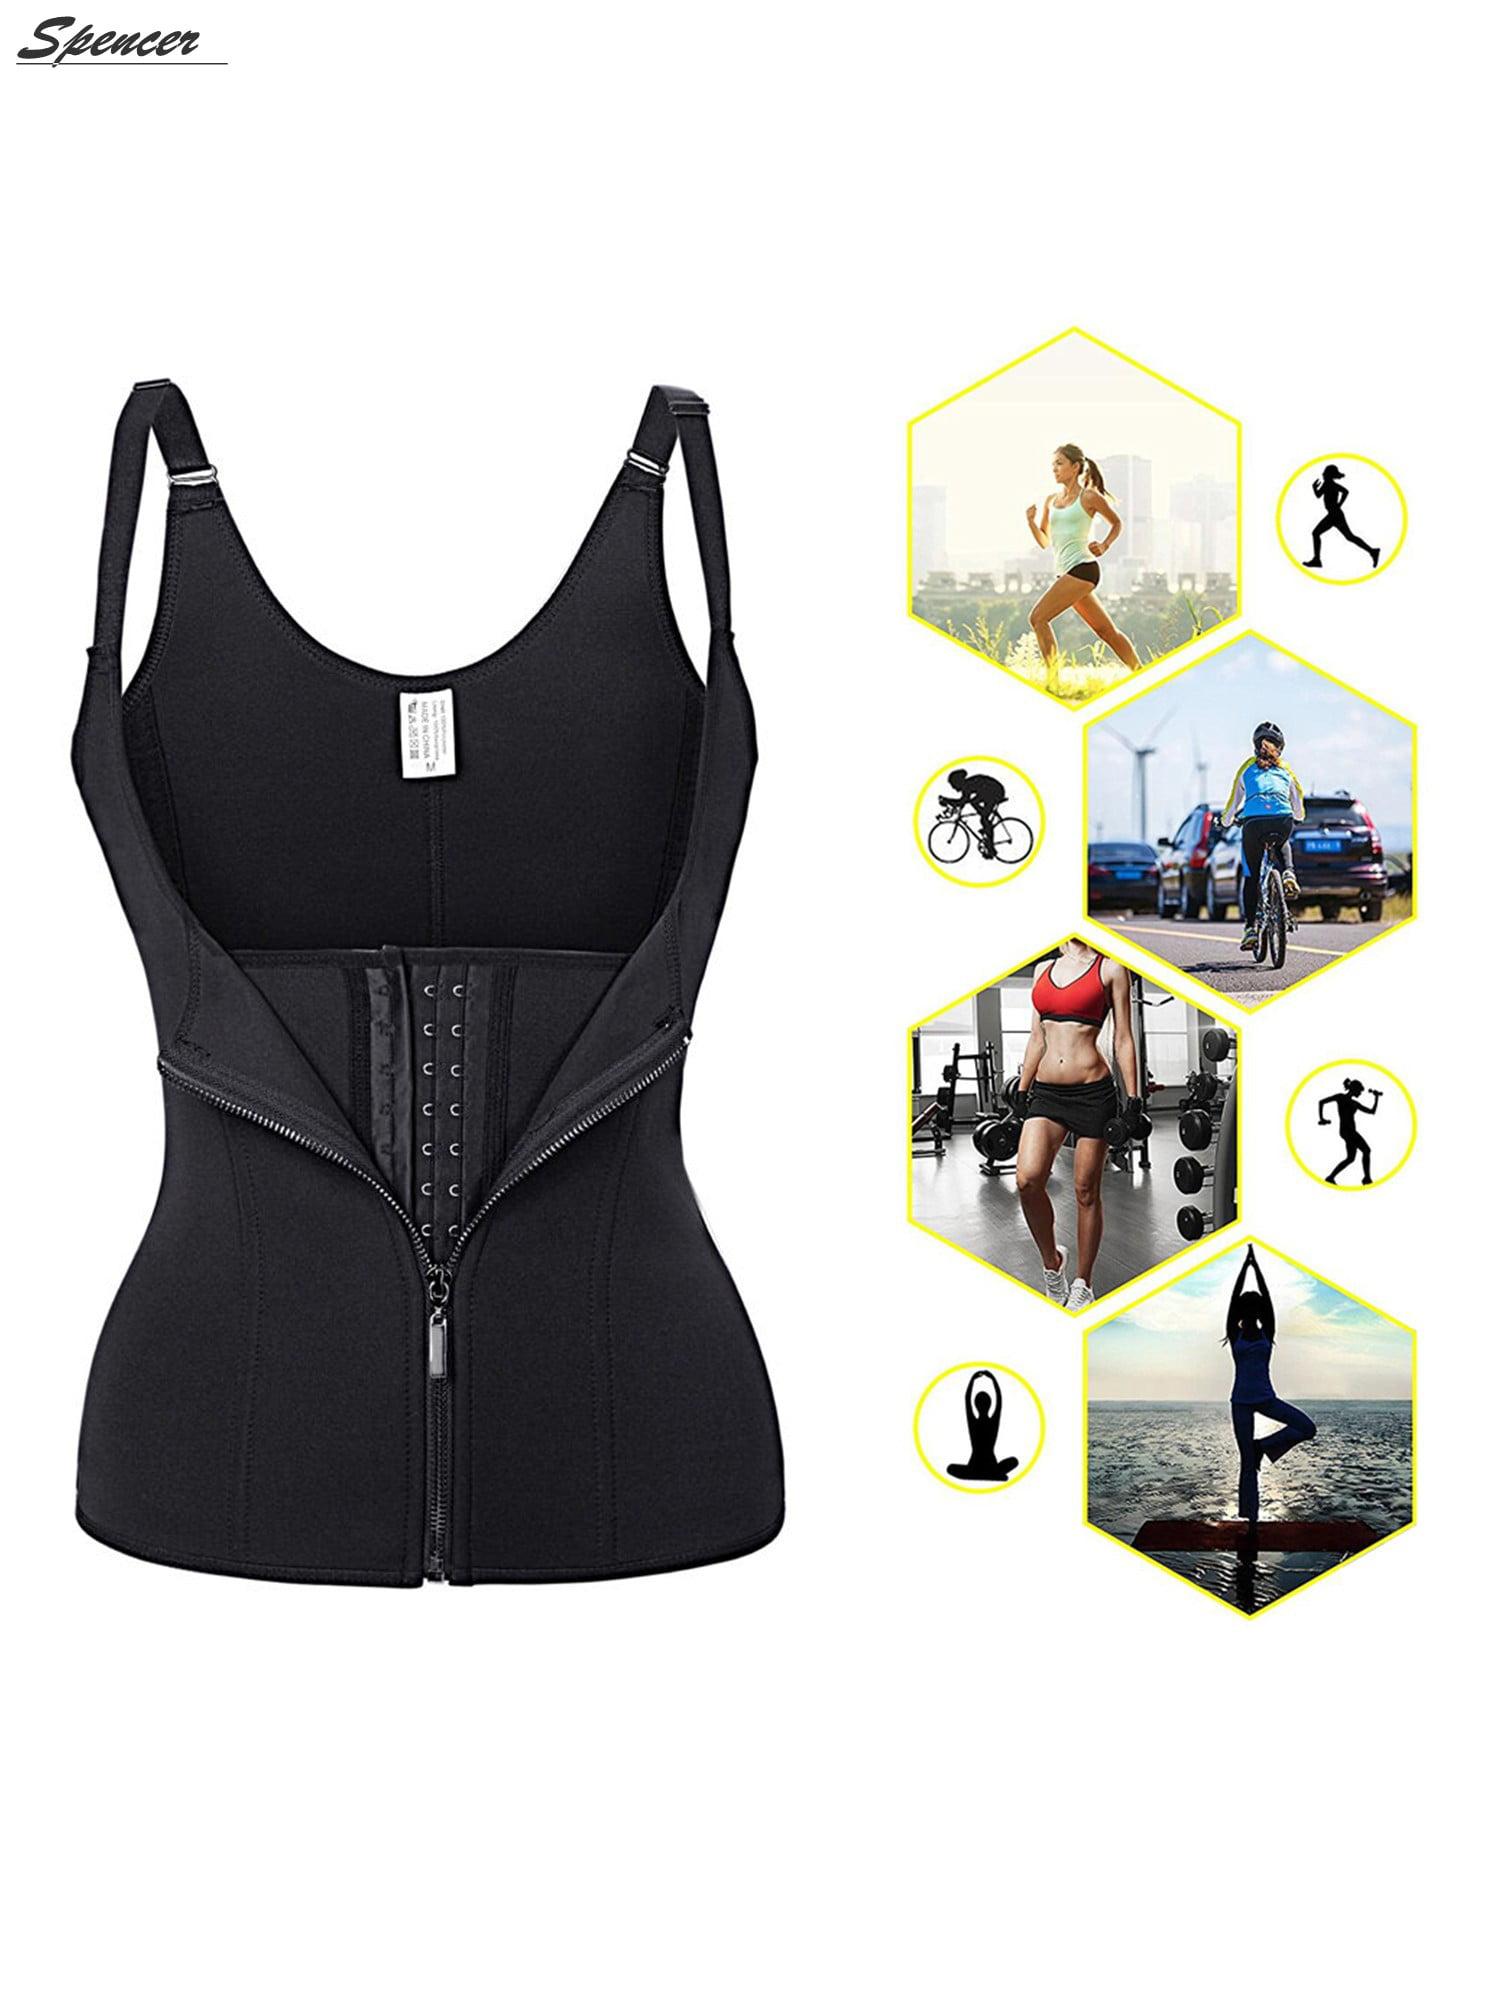 0bb3470905a38 Spencer - Spencer Women Sauna Body Shaper Waist Cincher Trainer Underbust  Corset Shapewear Tummy Control Slimming Vest